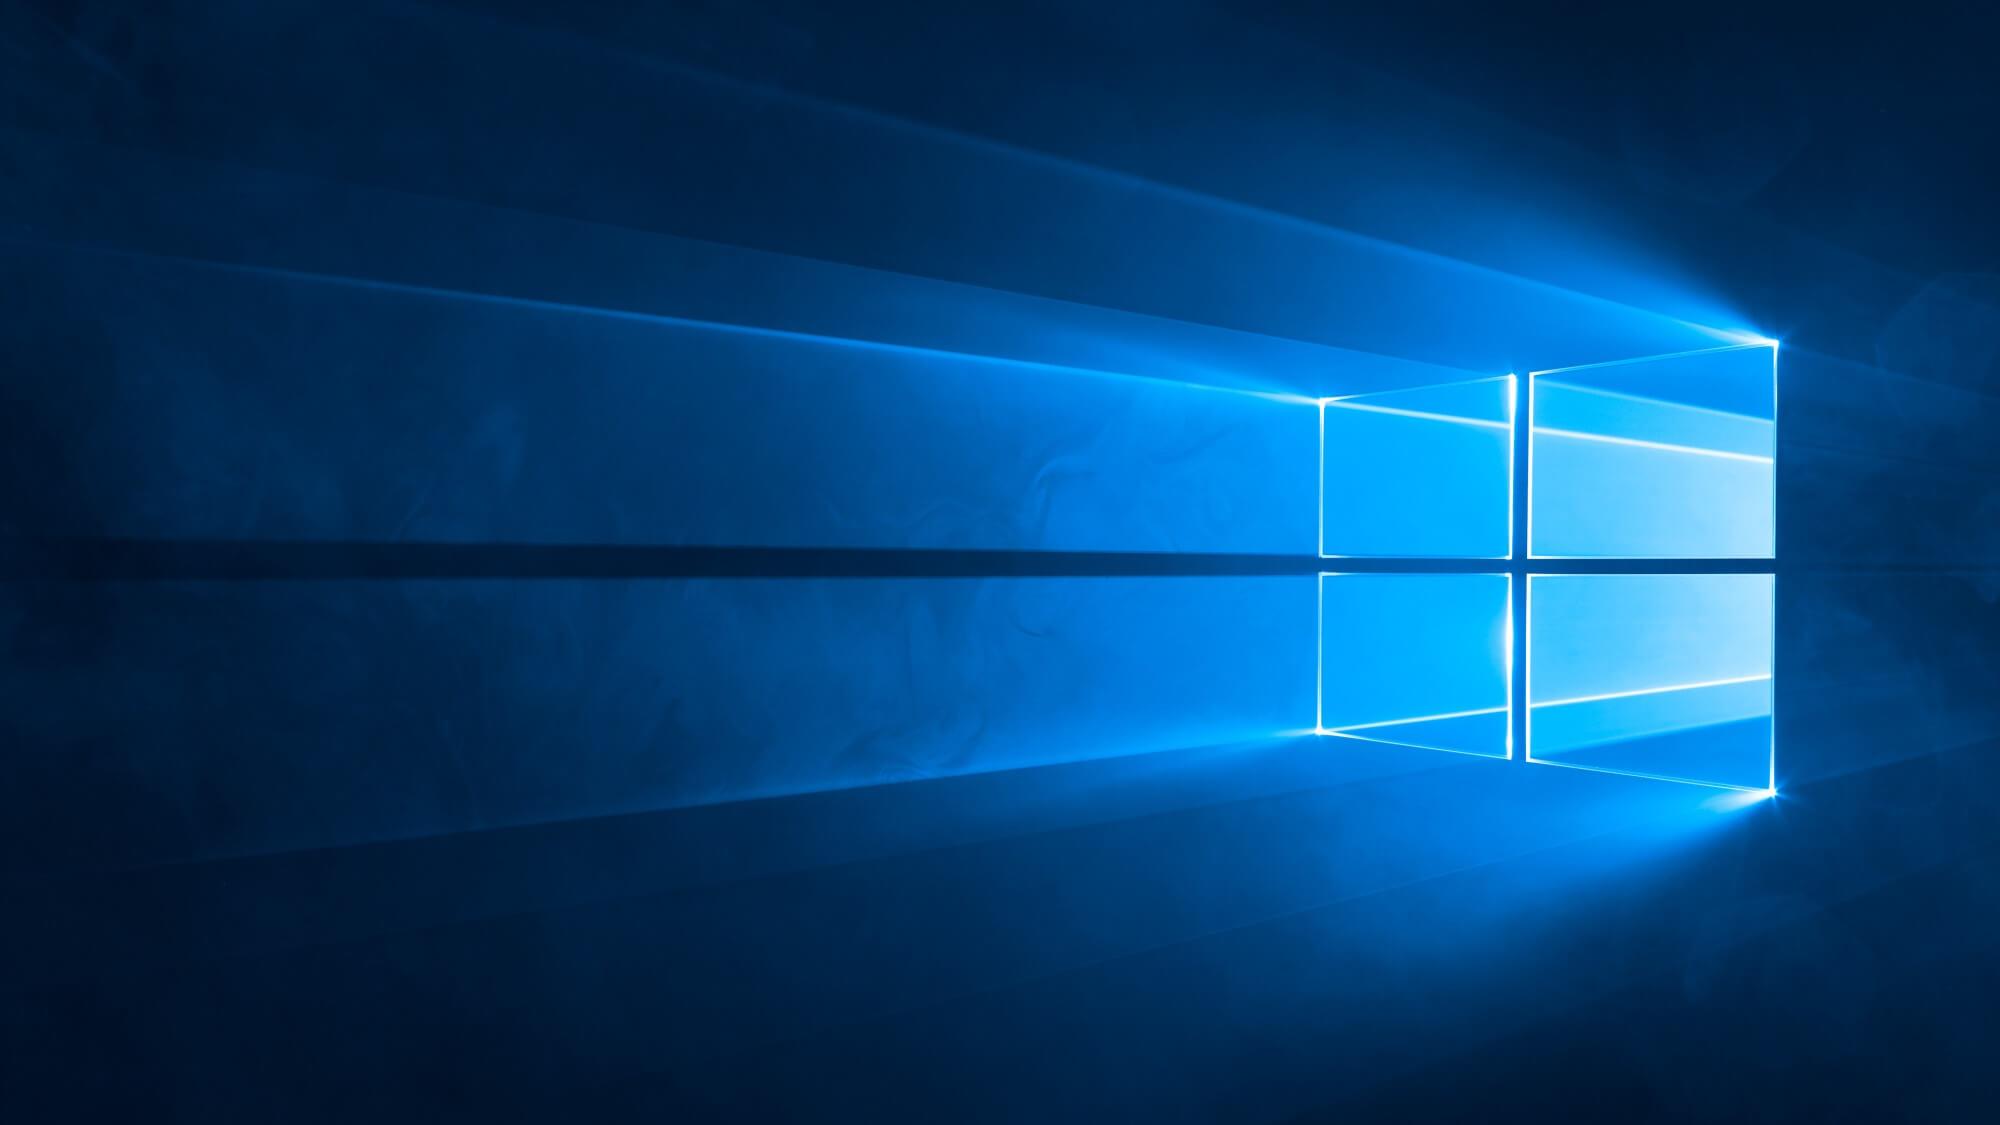 Microsoft has released its new Windows 10 100